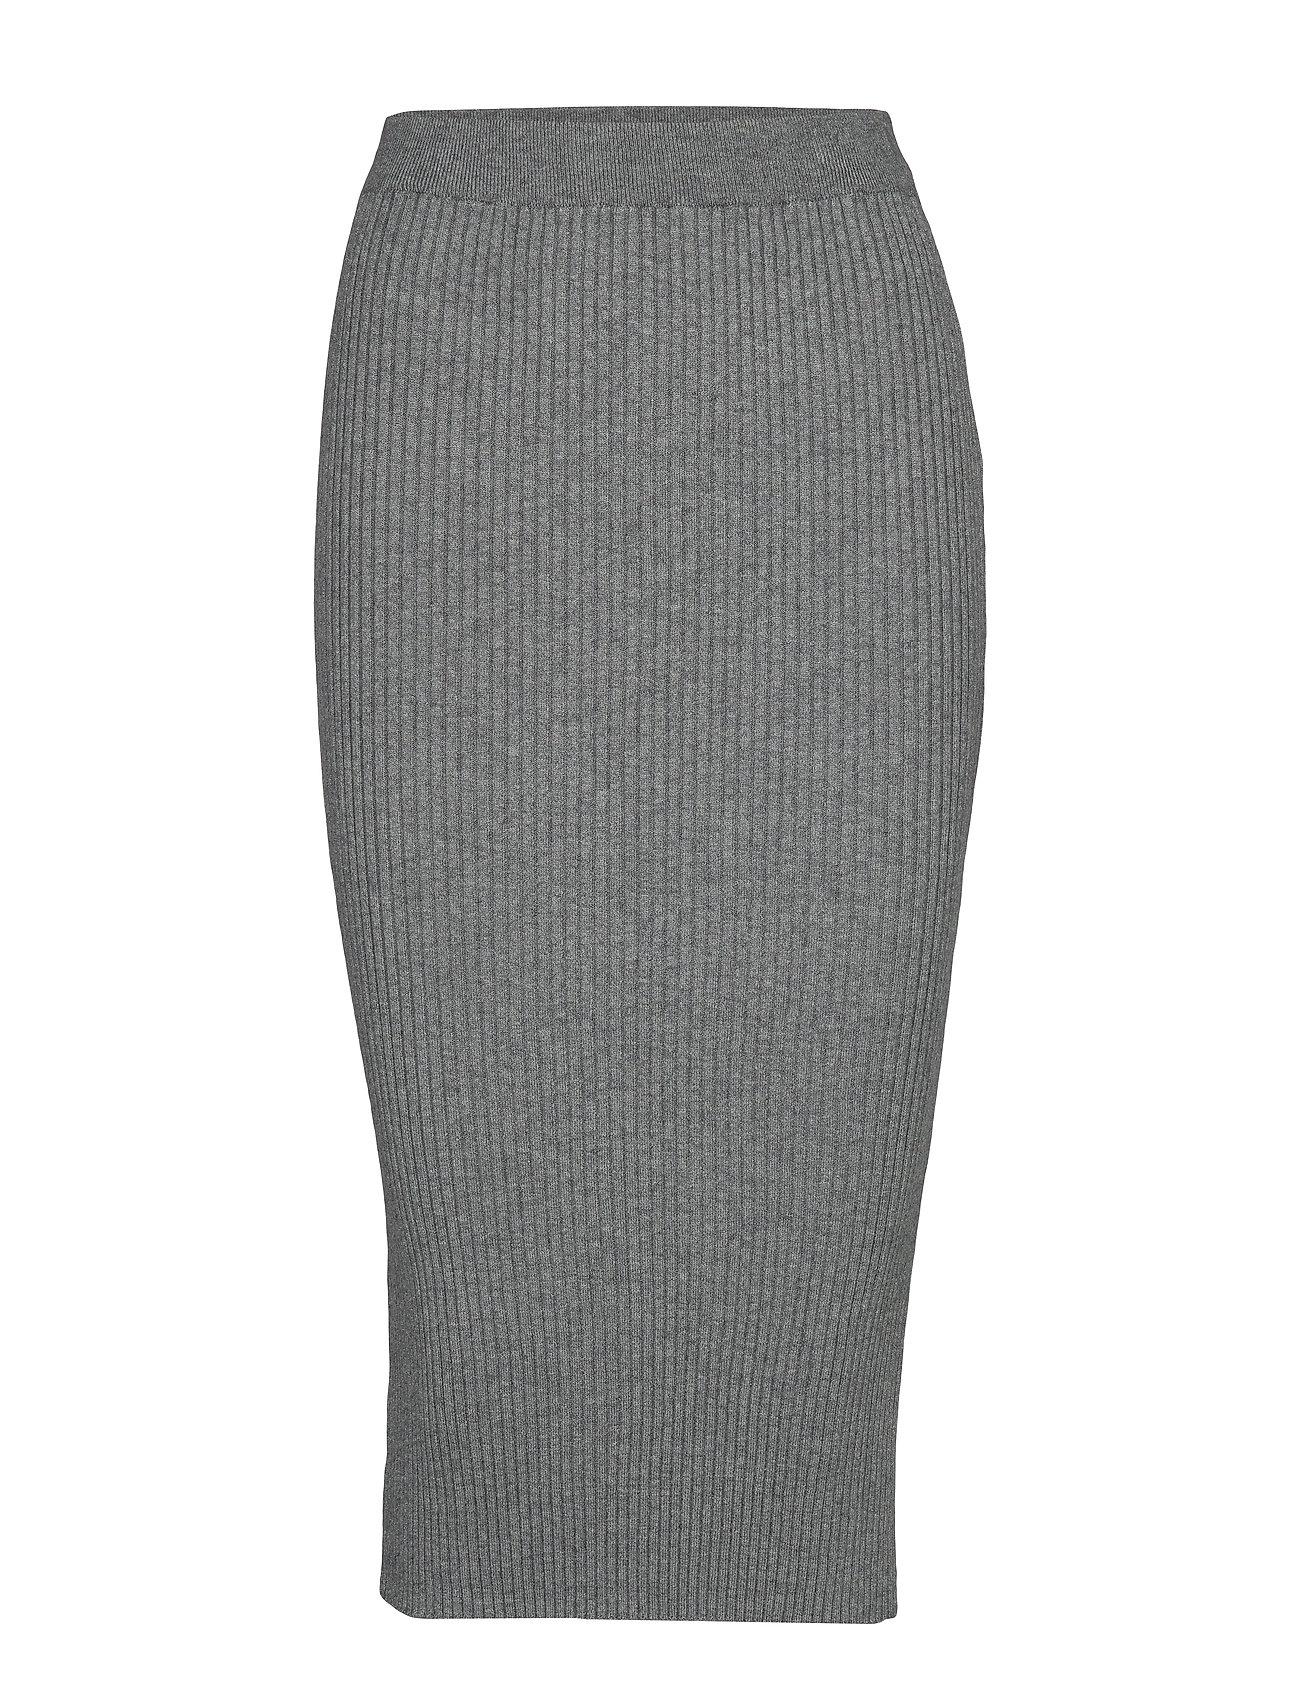 8 Knit MelangeVila 7 Violiv Skirt Grey Pencil lmedium eDHW2IEb9Y